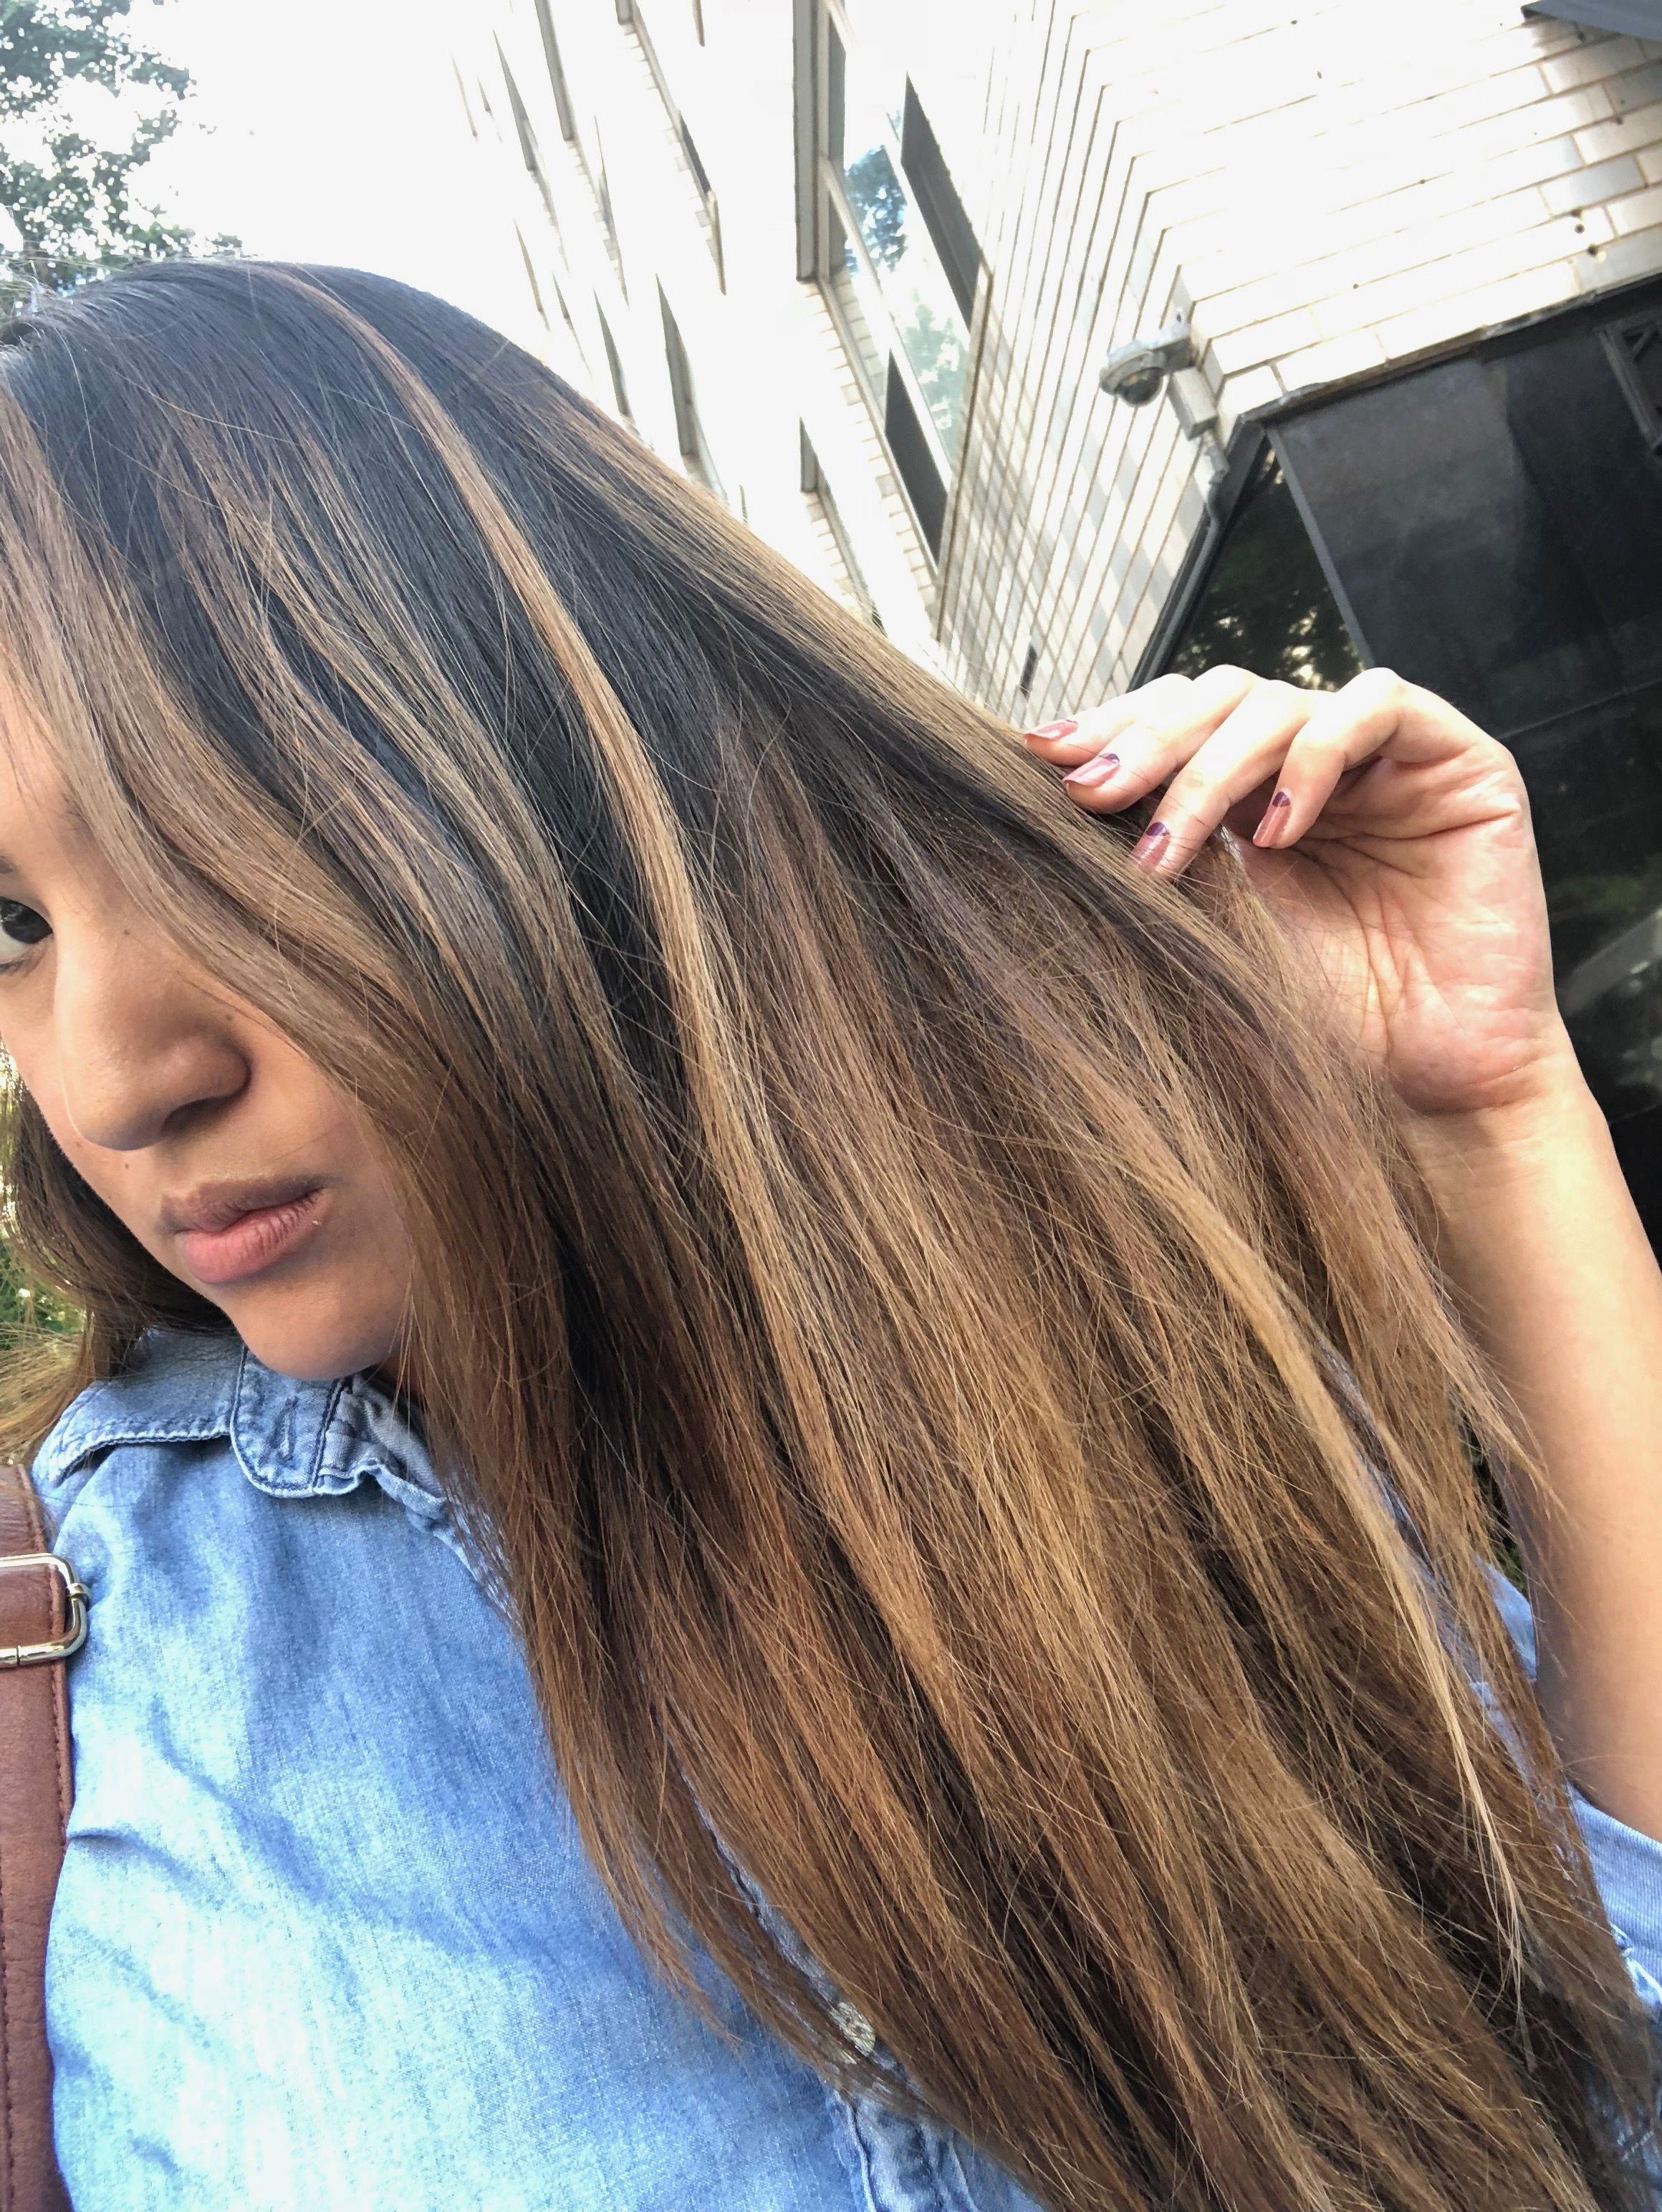 Dry Hair Repair - Tips for Dry, Damaged Hair